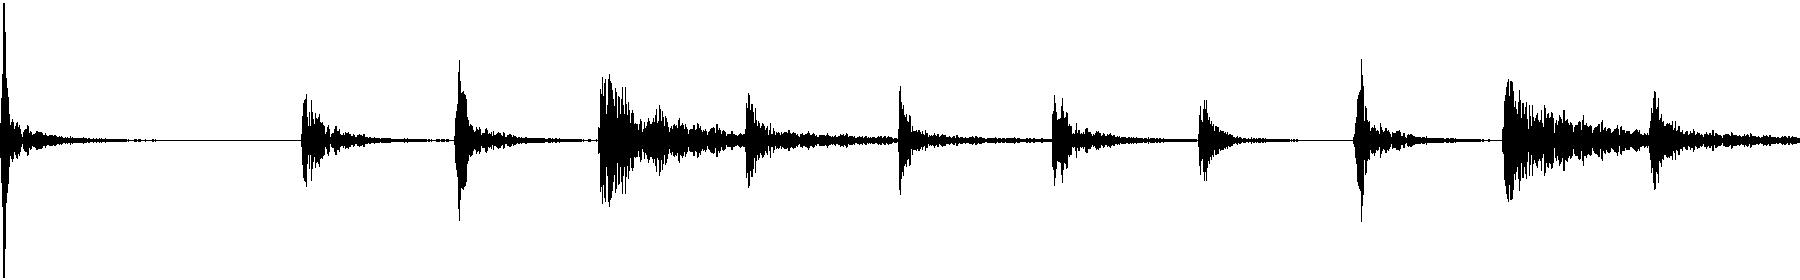 arab percussion loop 14